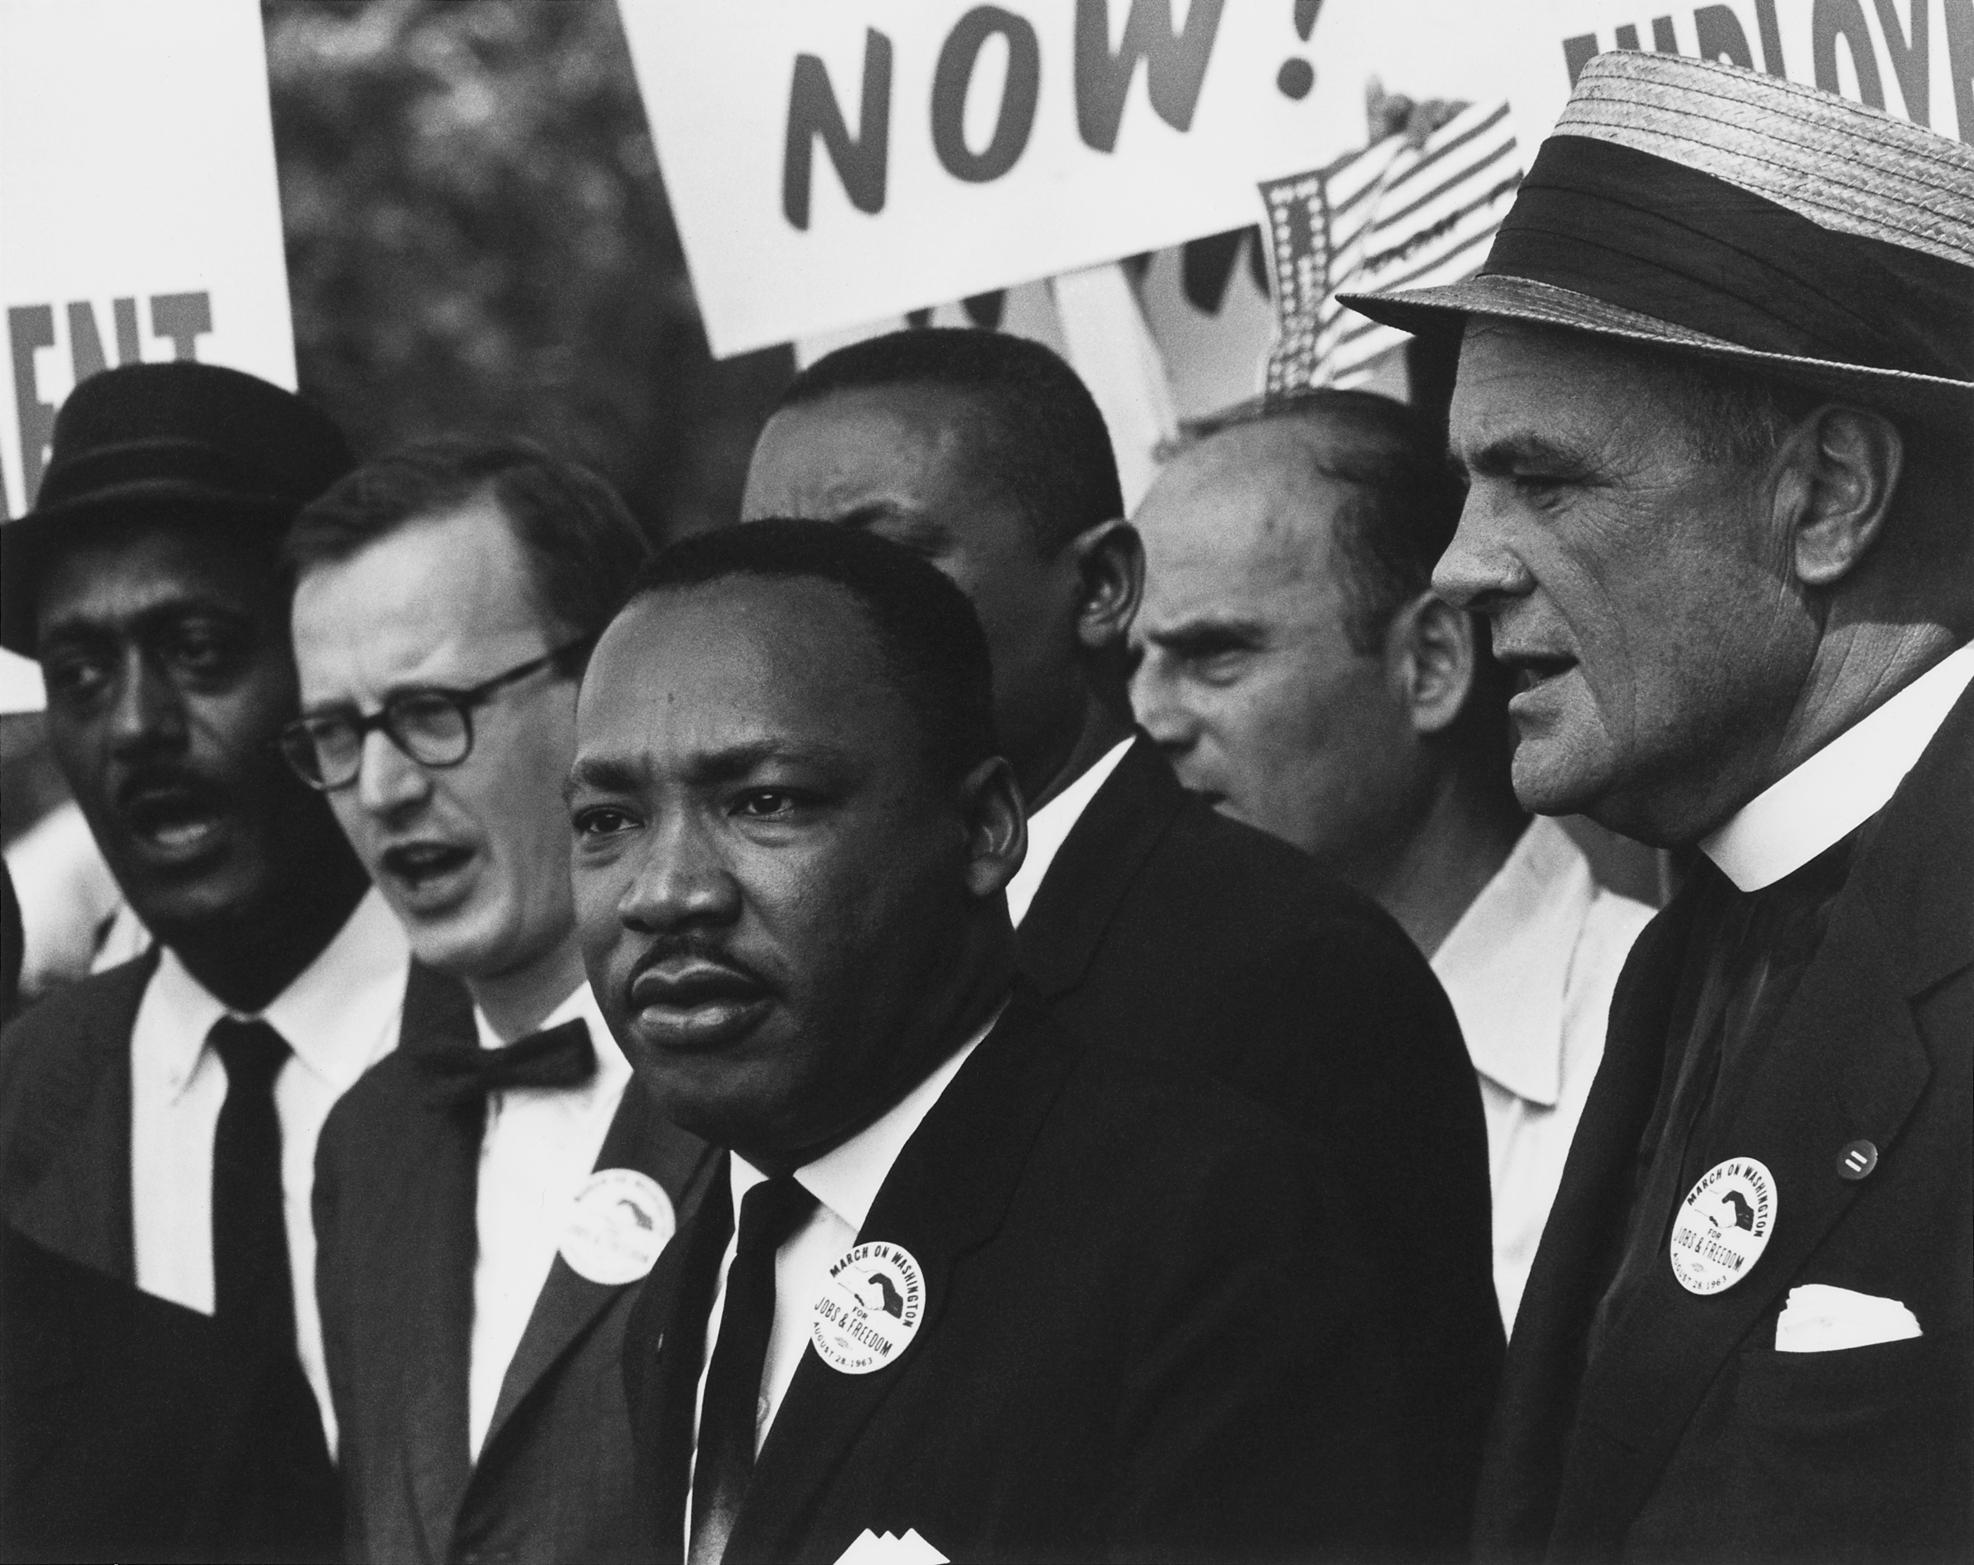 Civil_Rights_March_on_Washington__D.C._(Dr._Martin_Luther_King__Jr._and_Mathew_Ahmann_in_a_crowd.)_-_NARA_-_542015_-_Restoration.jpg